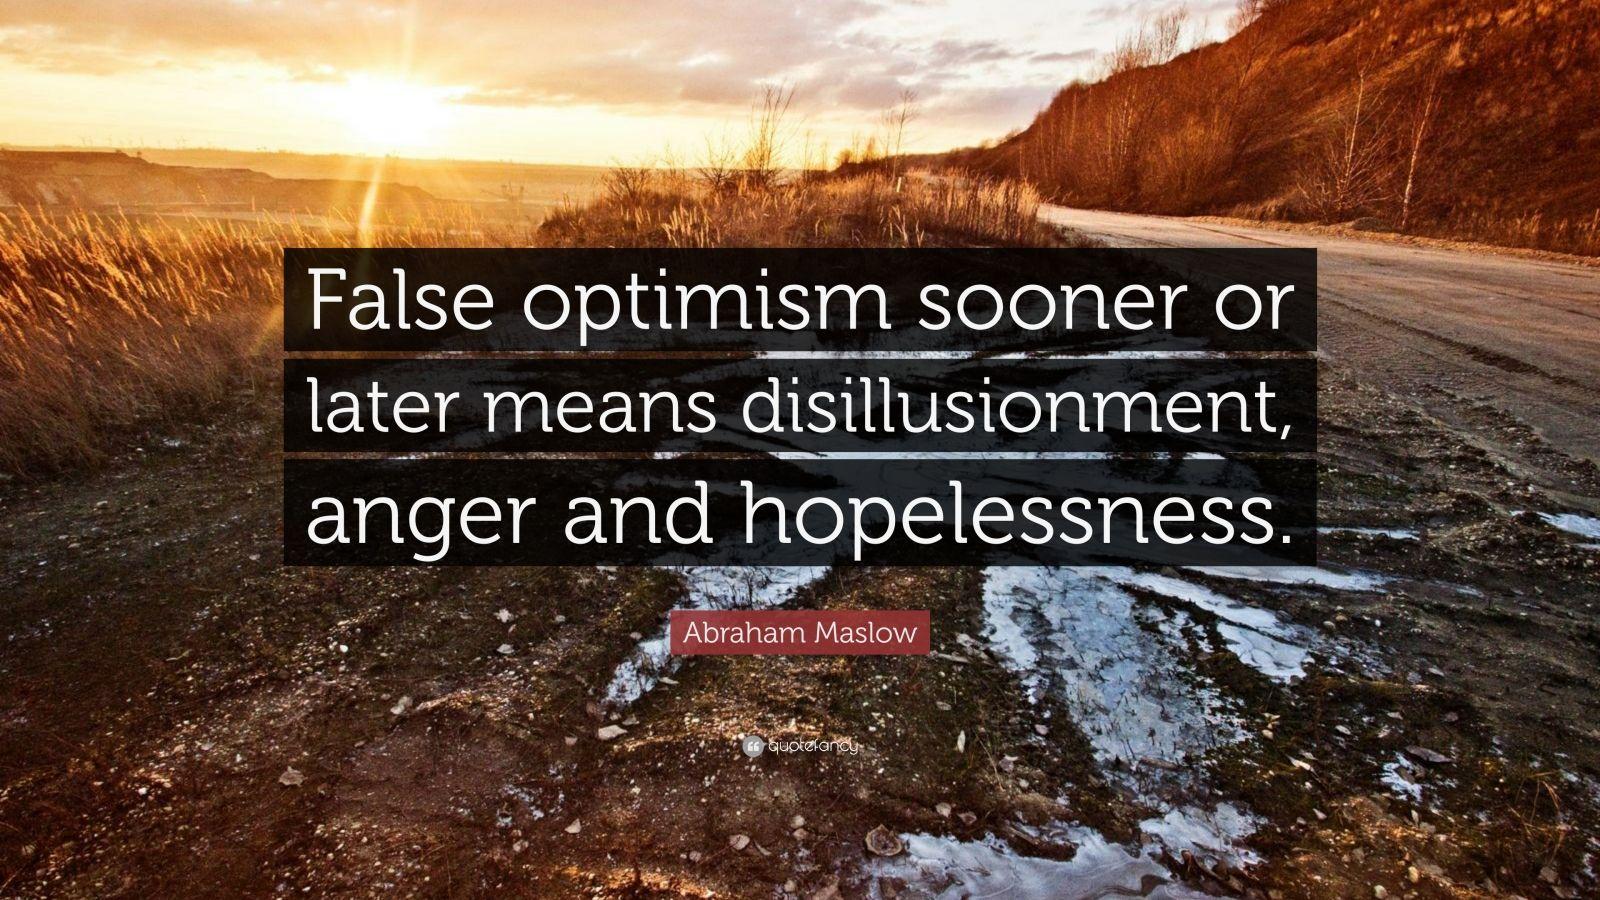 Abraham Maslow Quote False optimism sooner or later